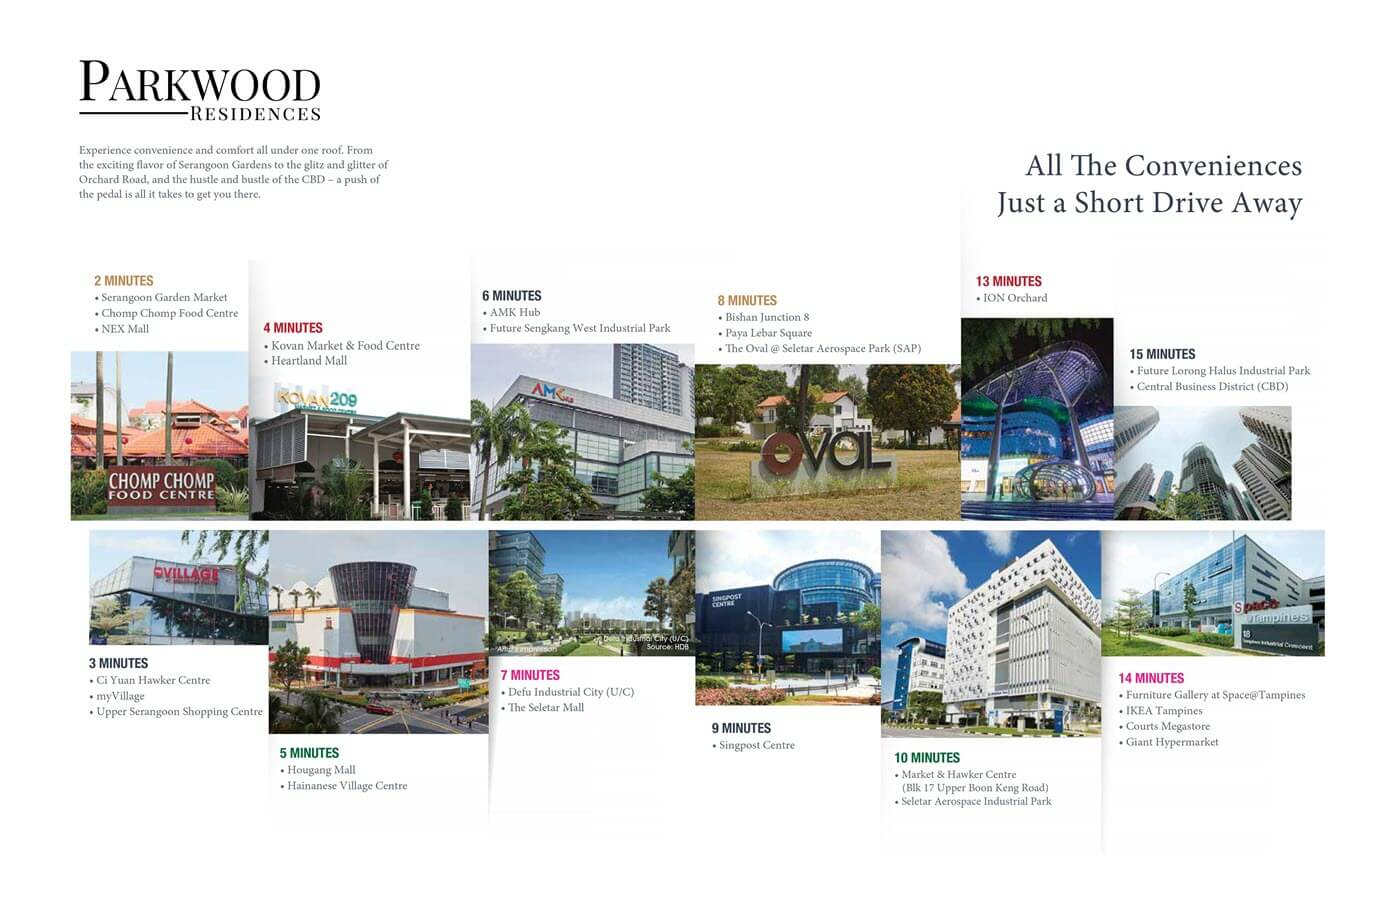 Parkwood Residences Condo Nearby Amenities